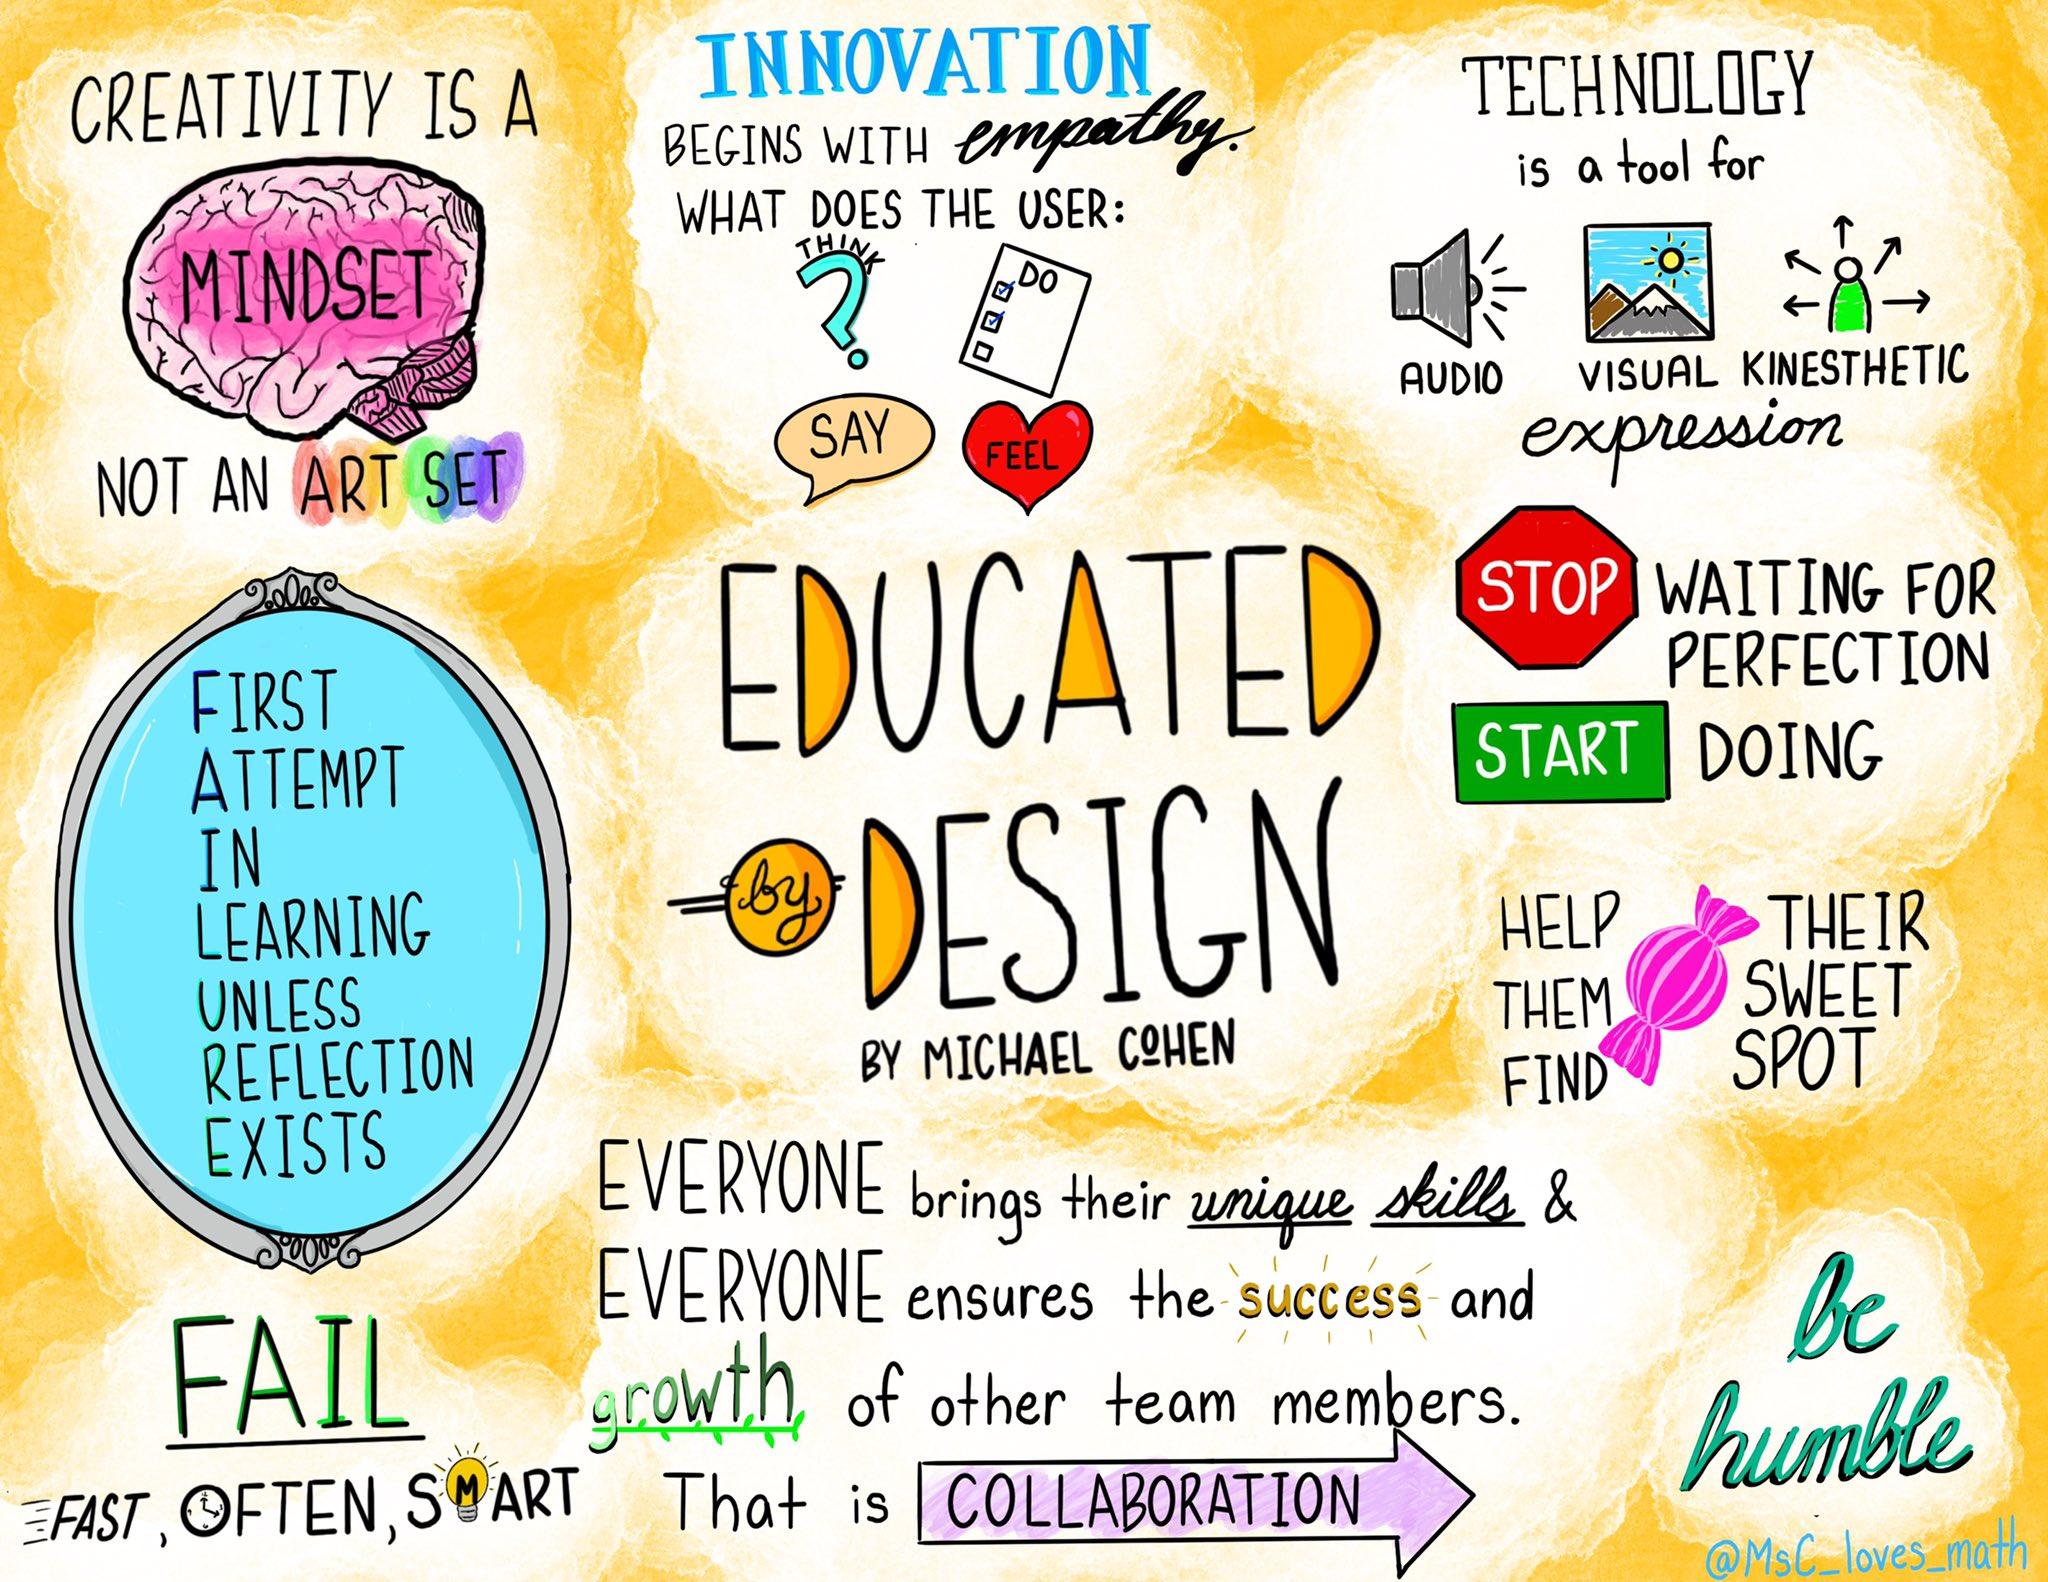 """Creativity is a mindset, not an art set"". My latest sketchnote reflection from #EducatedByDesign by @TheTechRabbi . https://t.co/lUgosXzMbv"